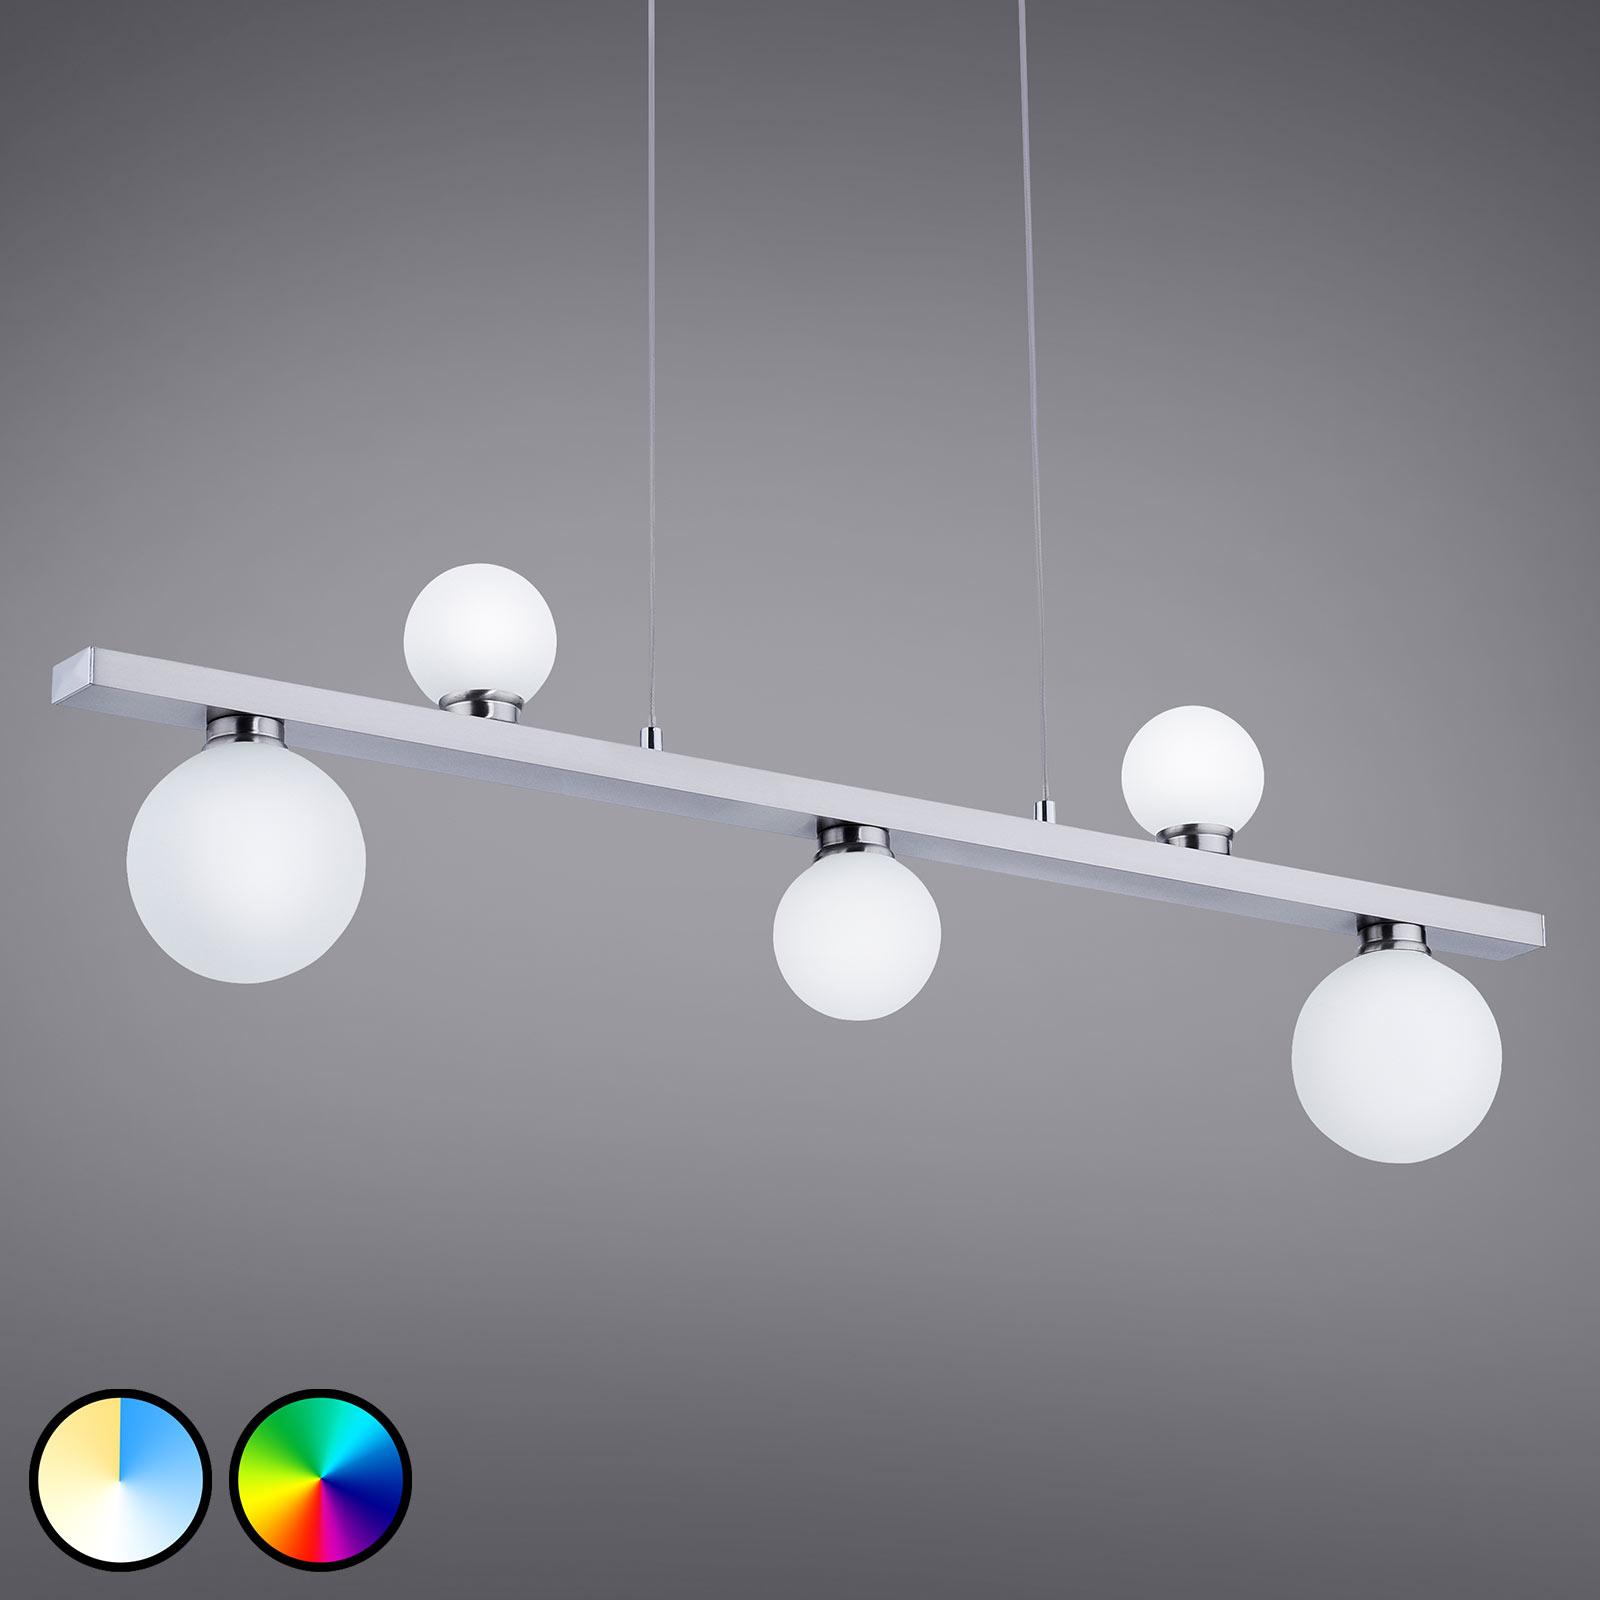 Trio WiZ Dicapo LED balk hanglamp, 5-lamps